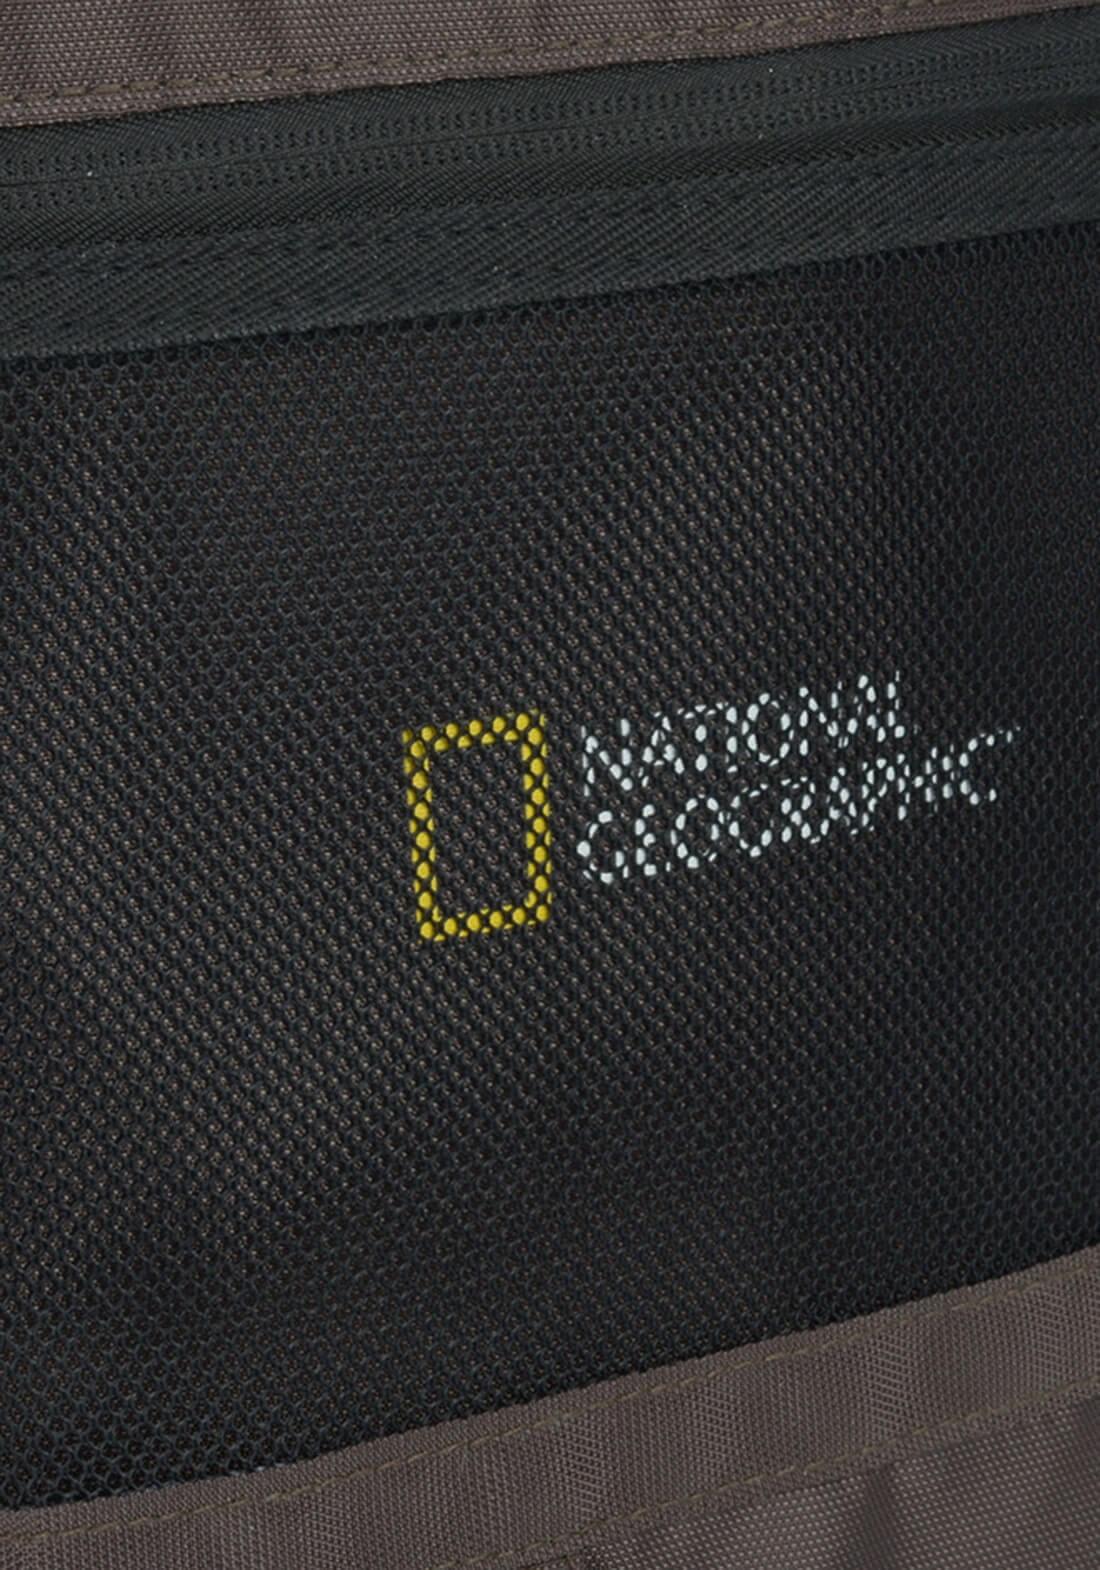 Mochila National Geografic Notebook Marrom Original